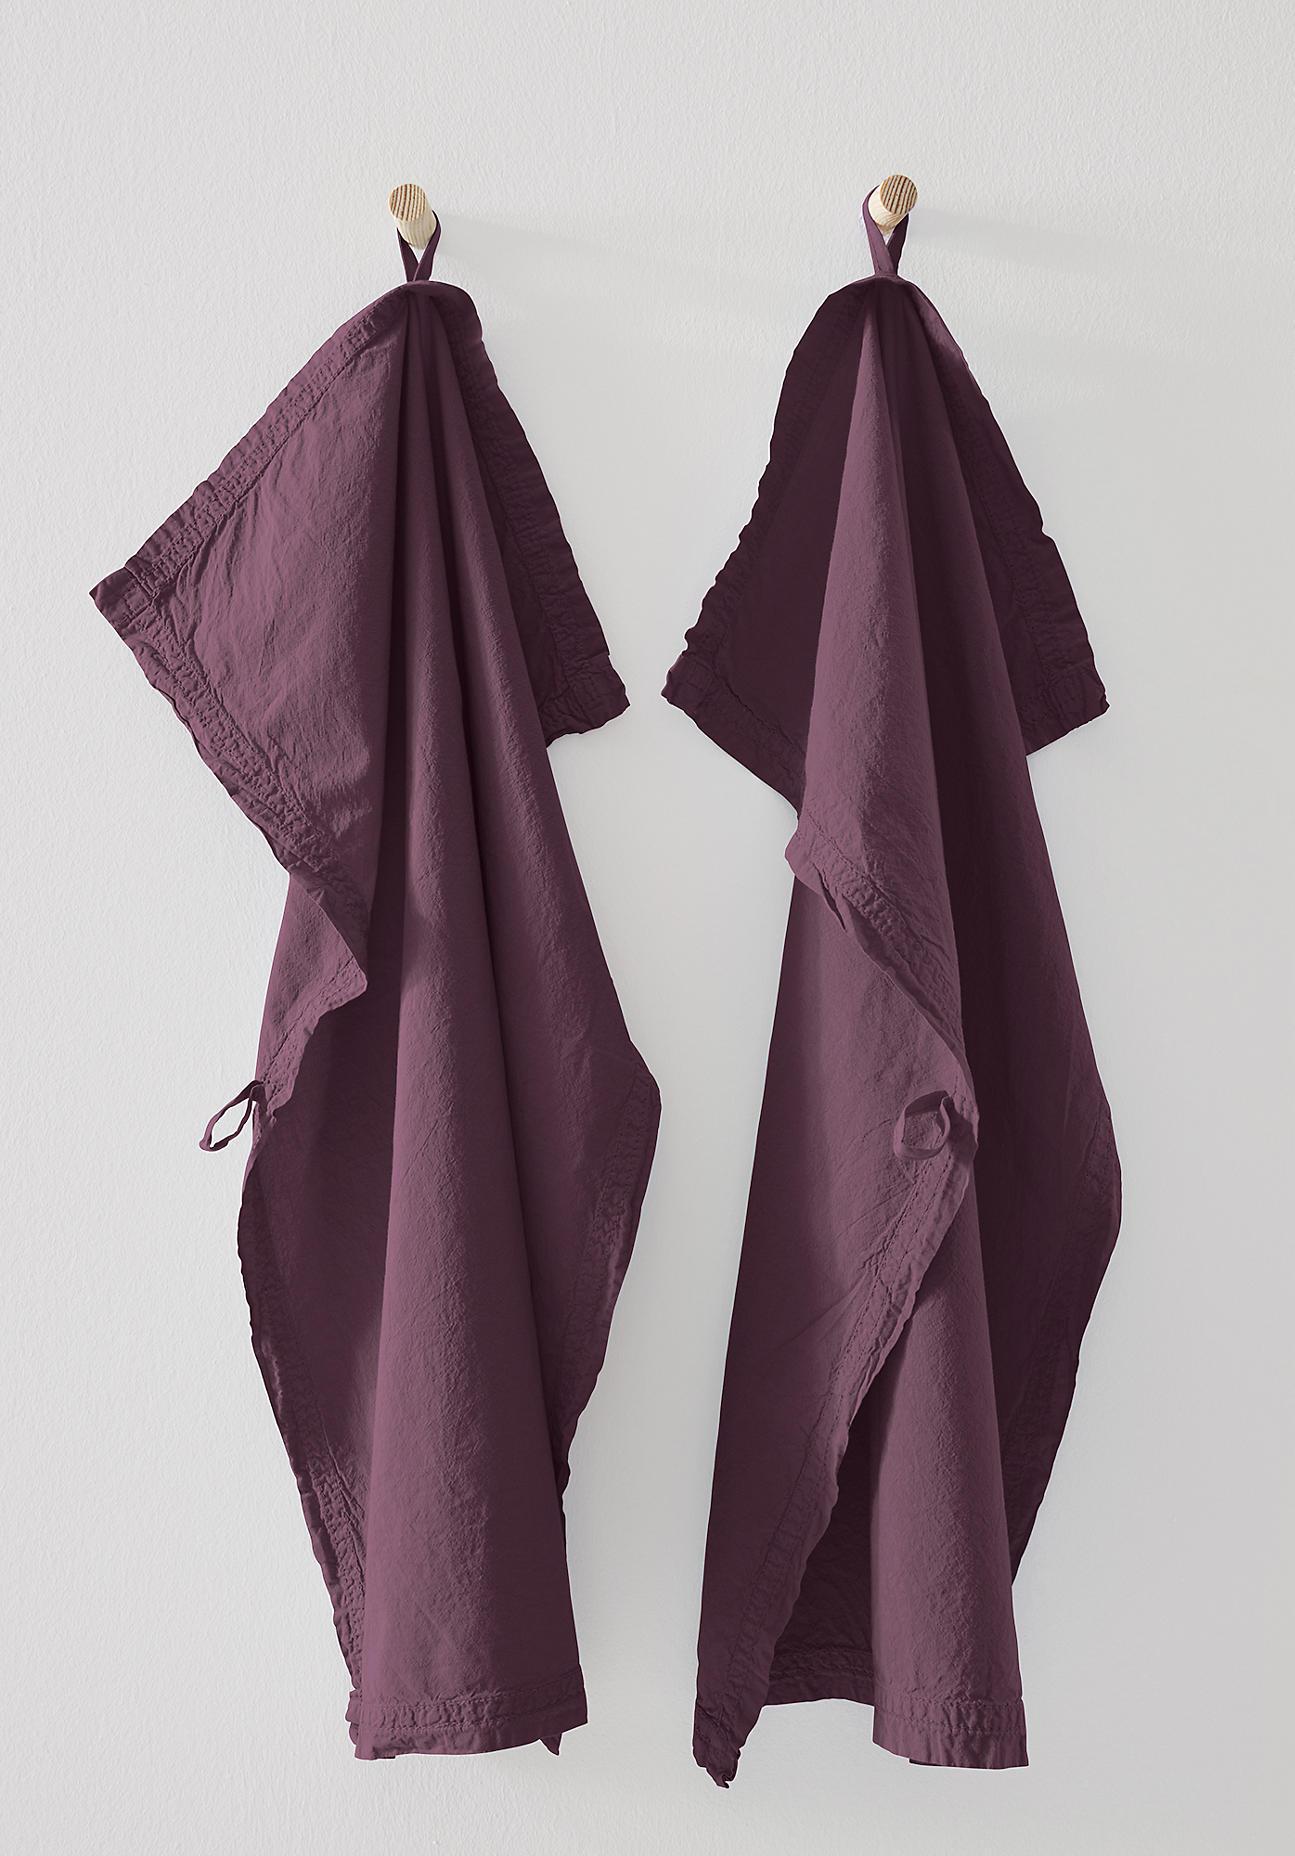 hessnatur Perkal-Geschirrtuch aus Bio-Baumwolle im 2er Set – lila – Größe 70x50 cm